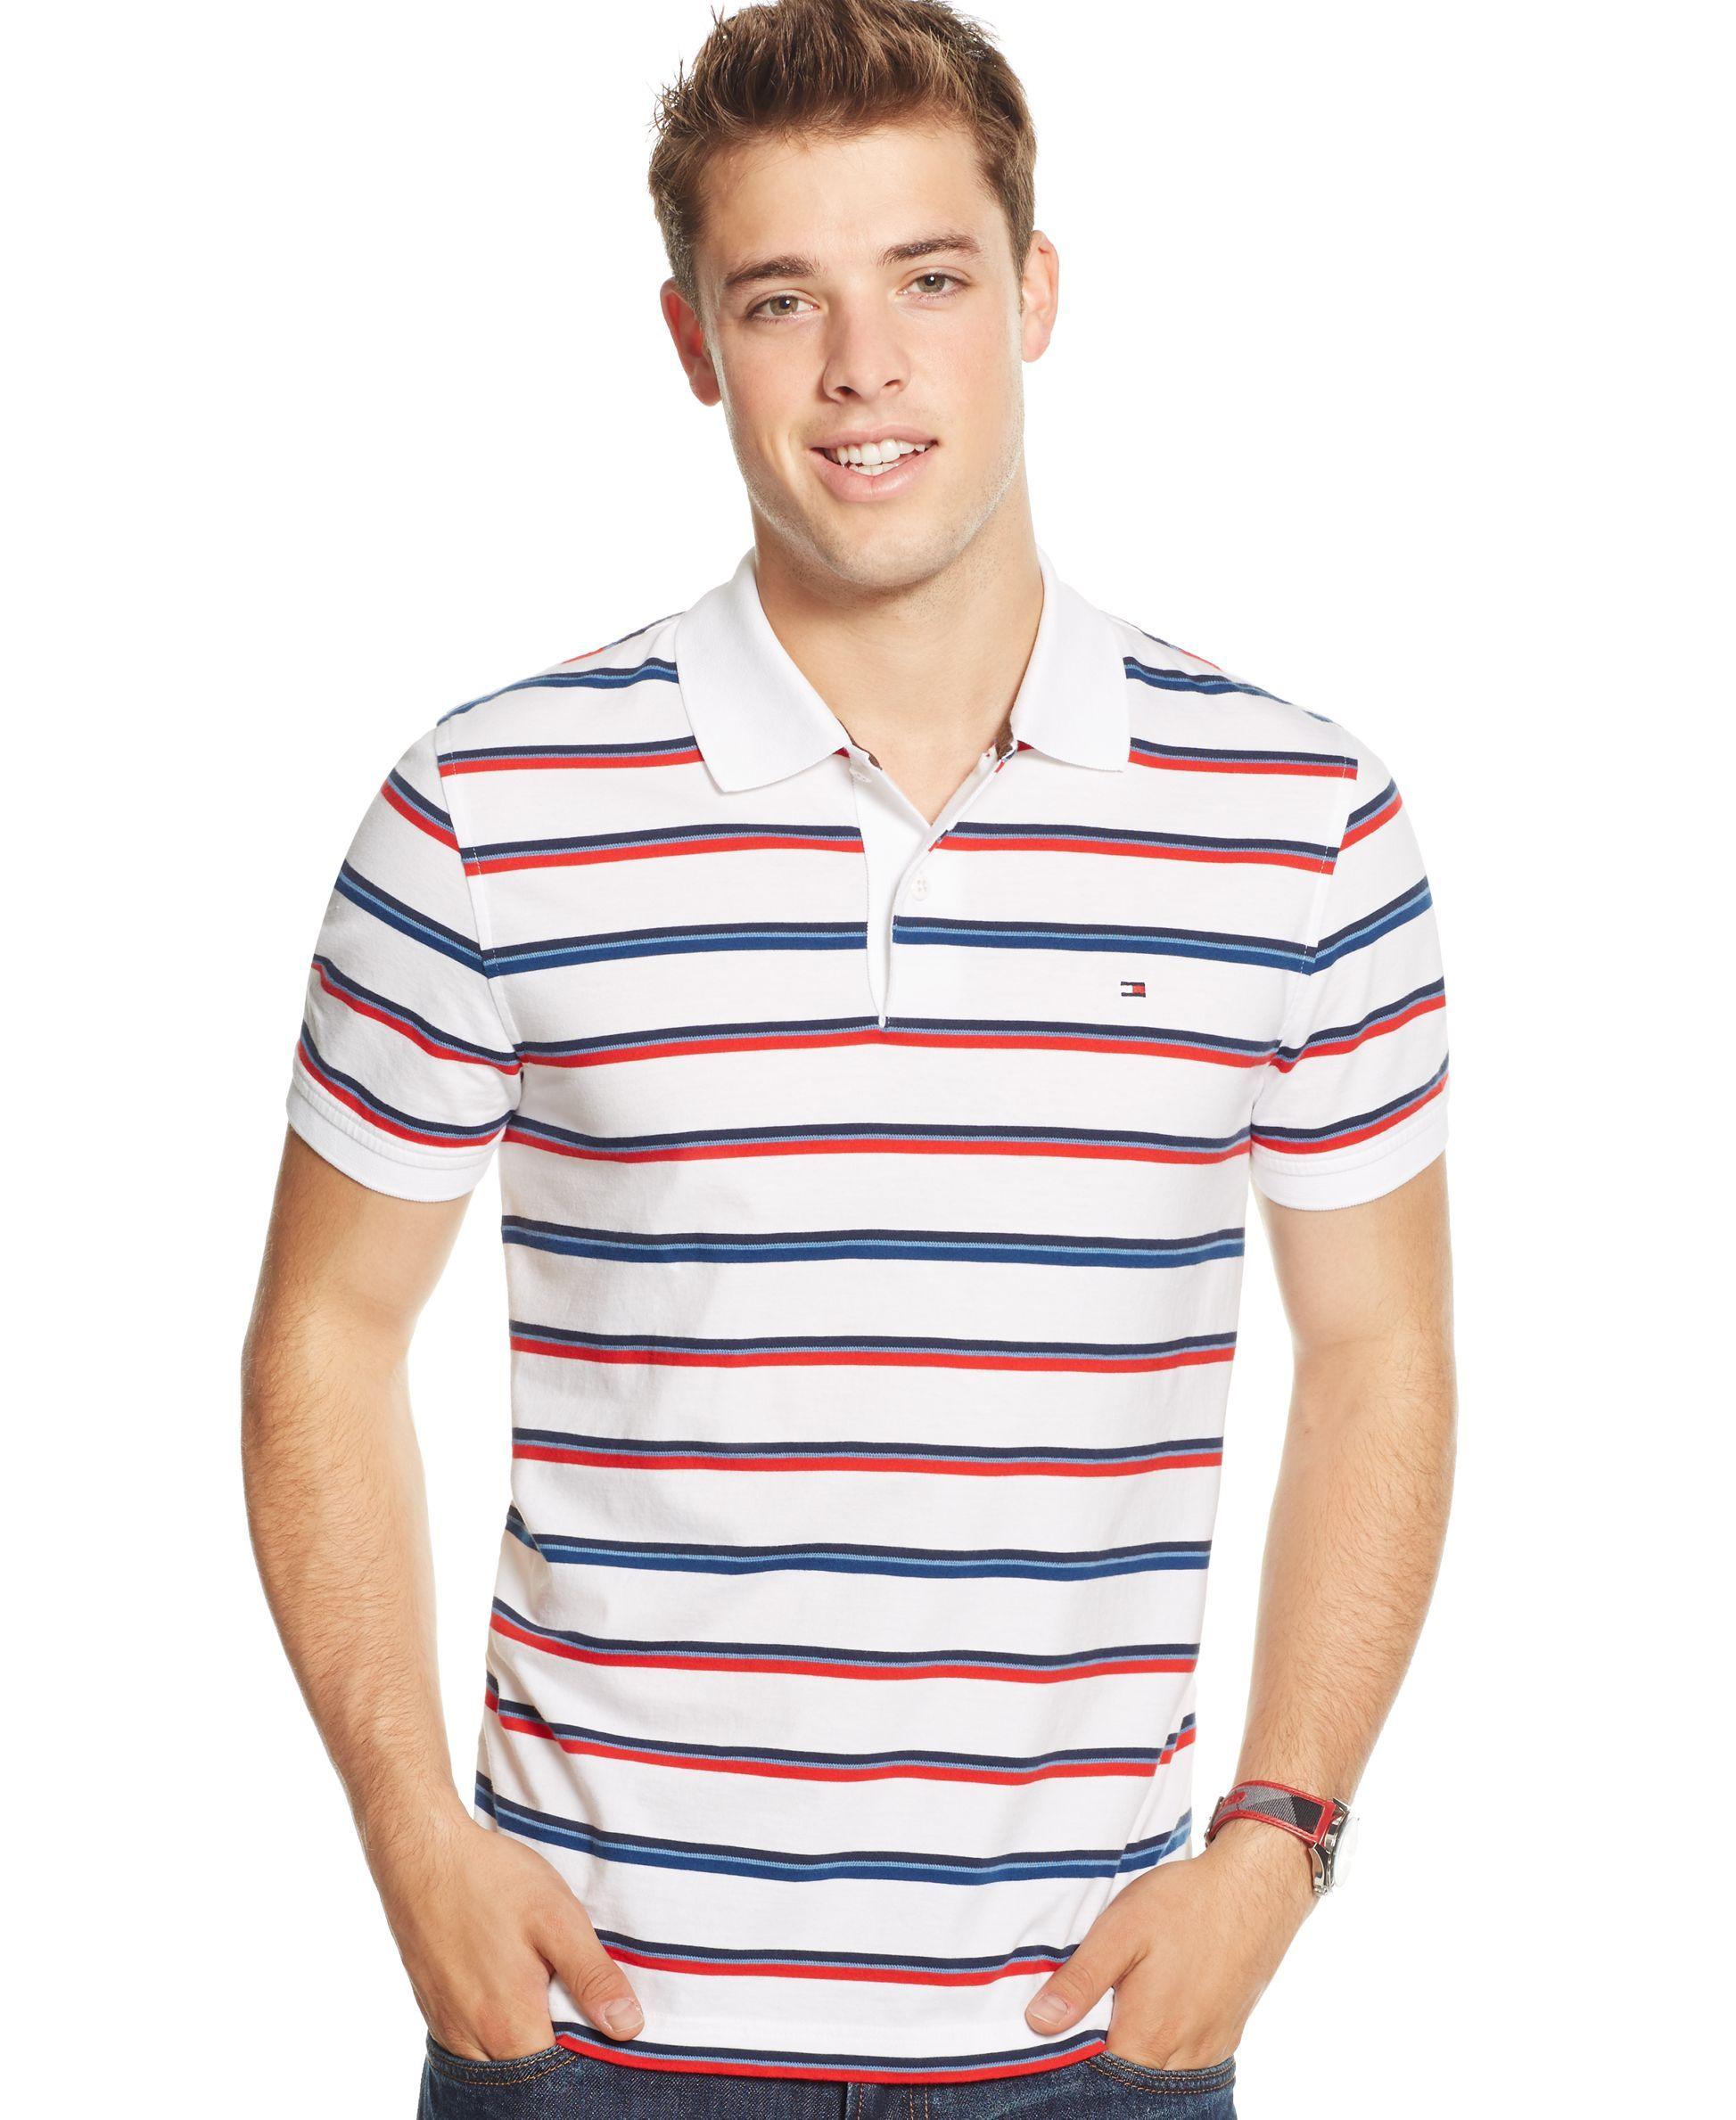 f0da81251bec64 Tommy Hilfiger Striped Polo Shirt